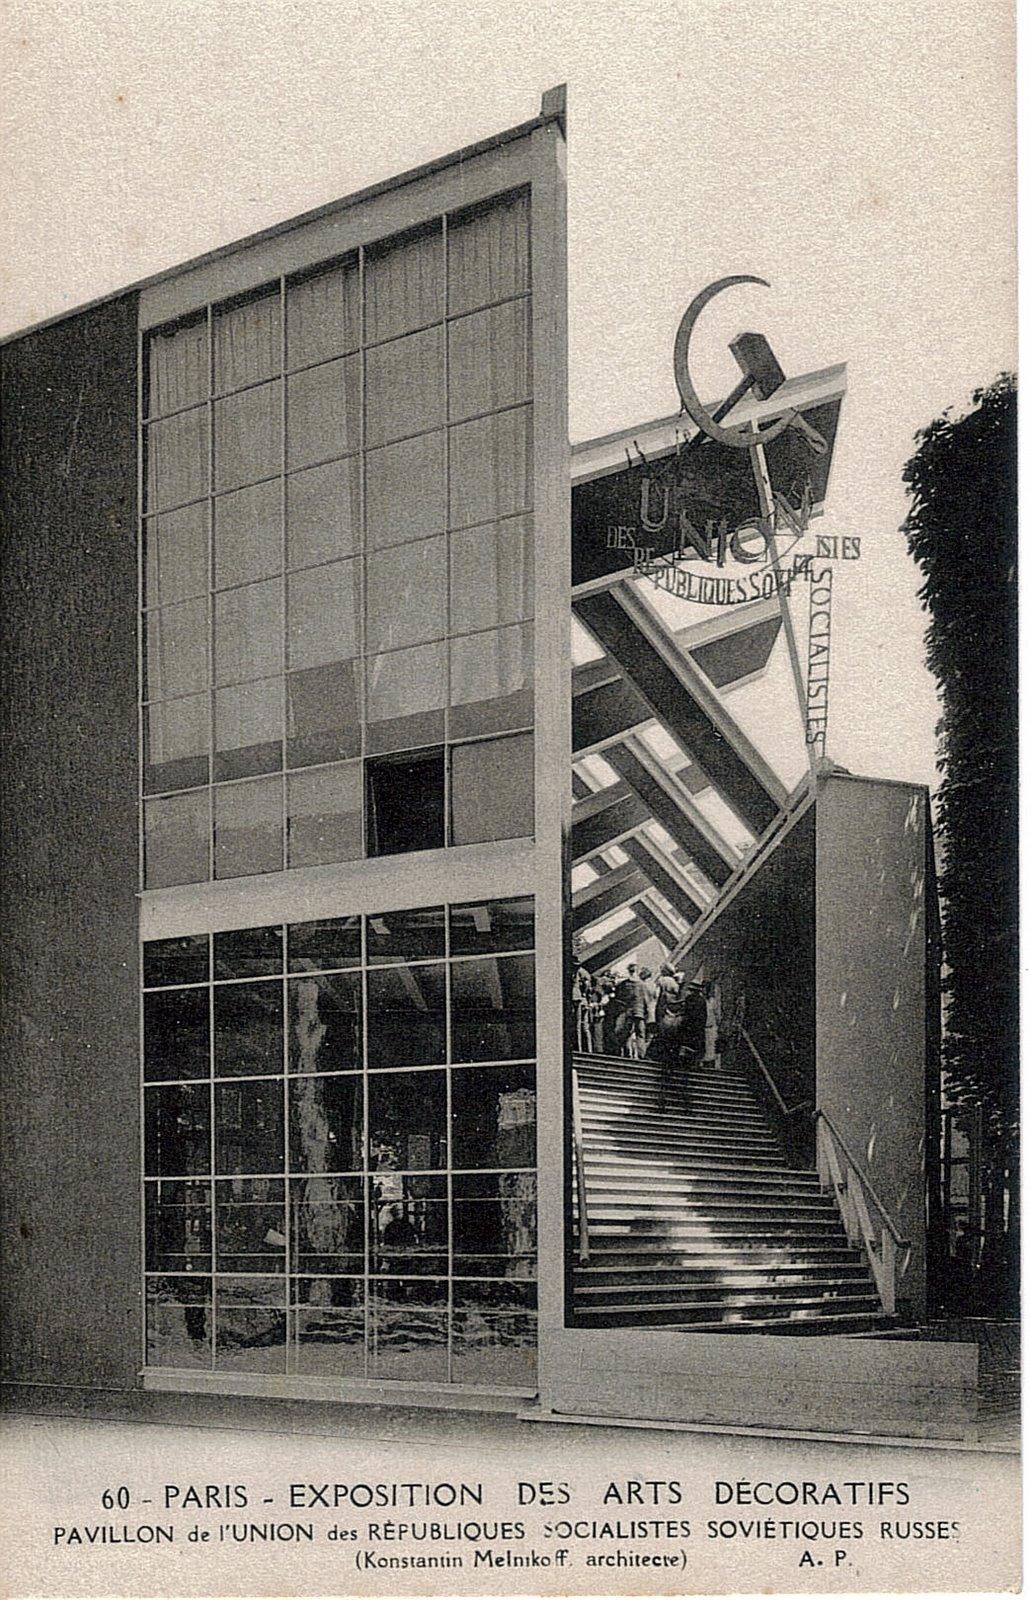 Postcard featuring Mel'nikov's Soviet Pavilion in Paris, 1925.